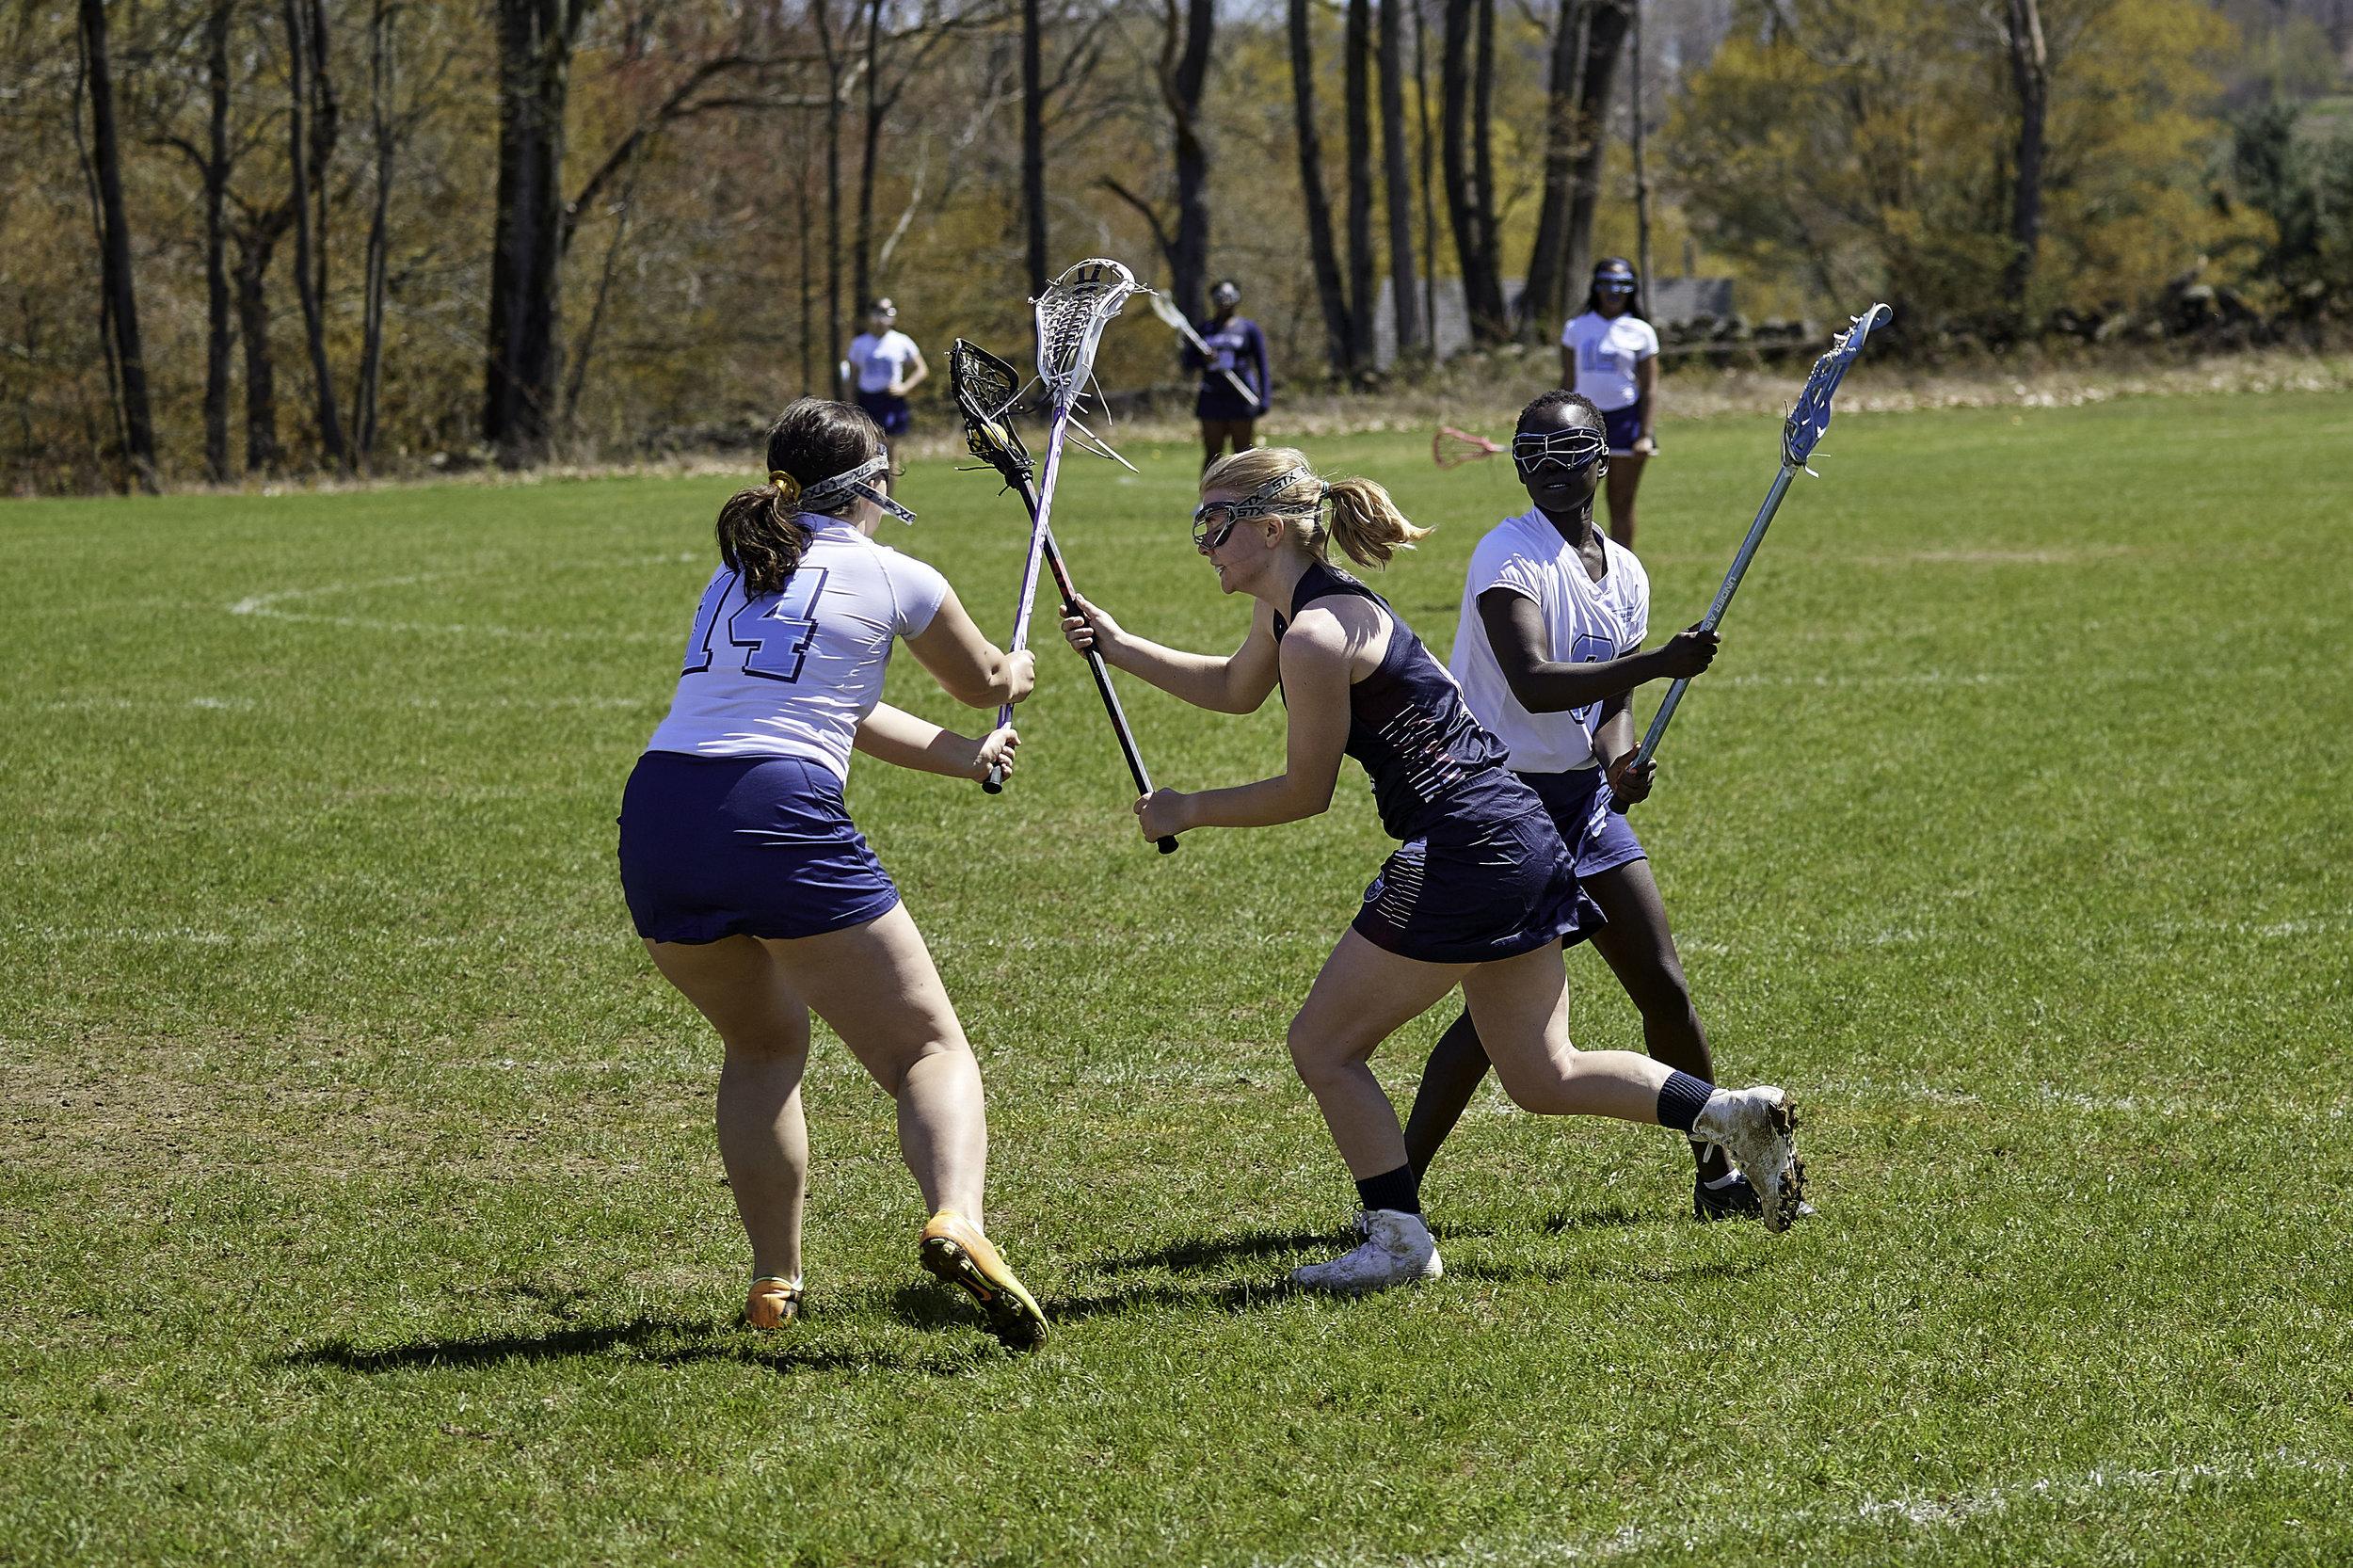 Girls Lacrosse vs. Stoneleigh Burnham School - May 11, 2019 - May 10, 2019193185.jpg